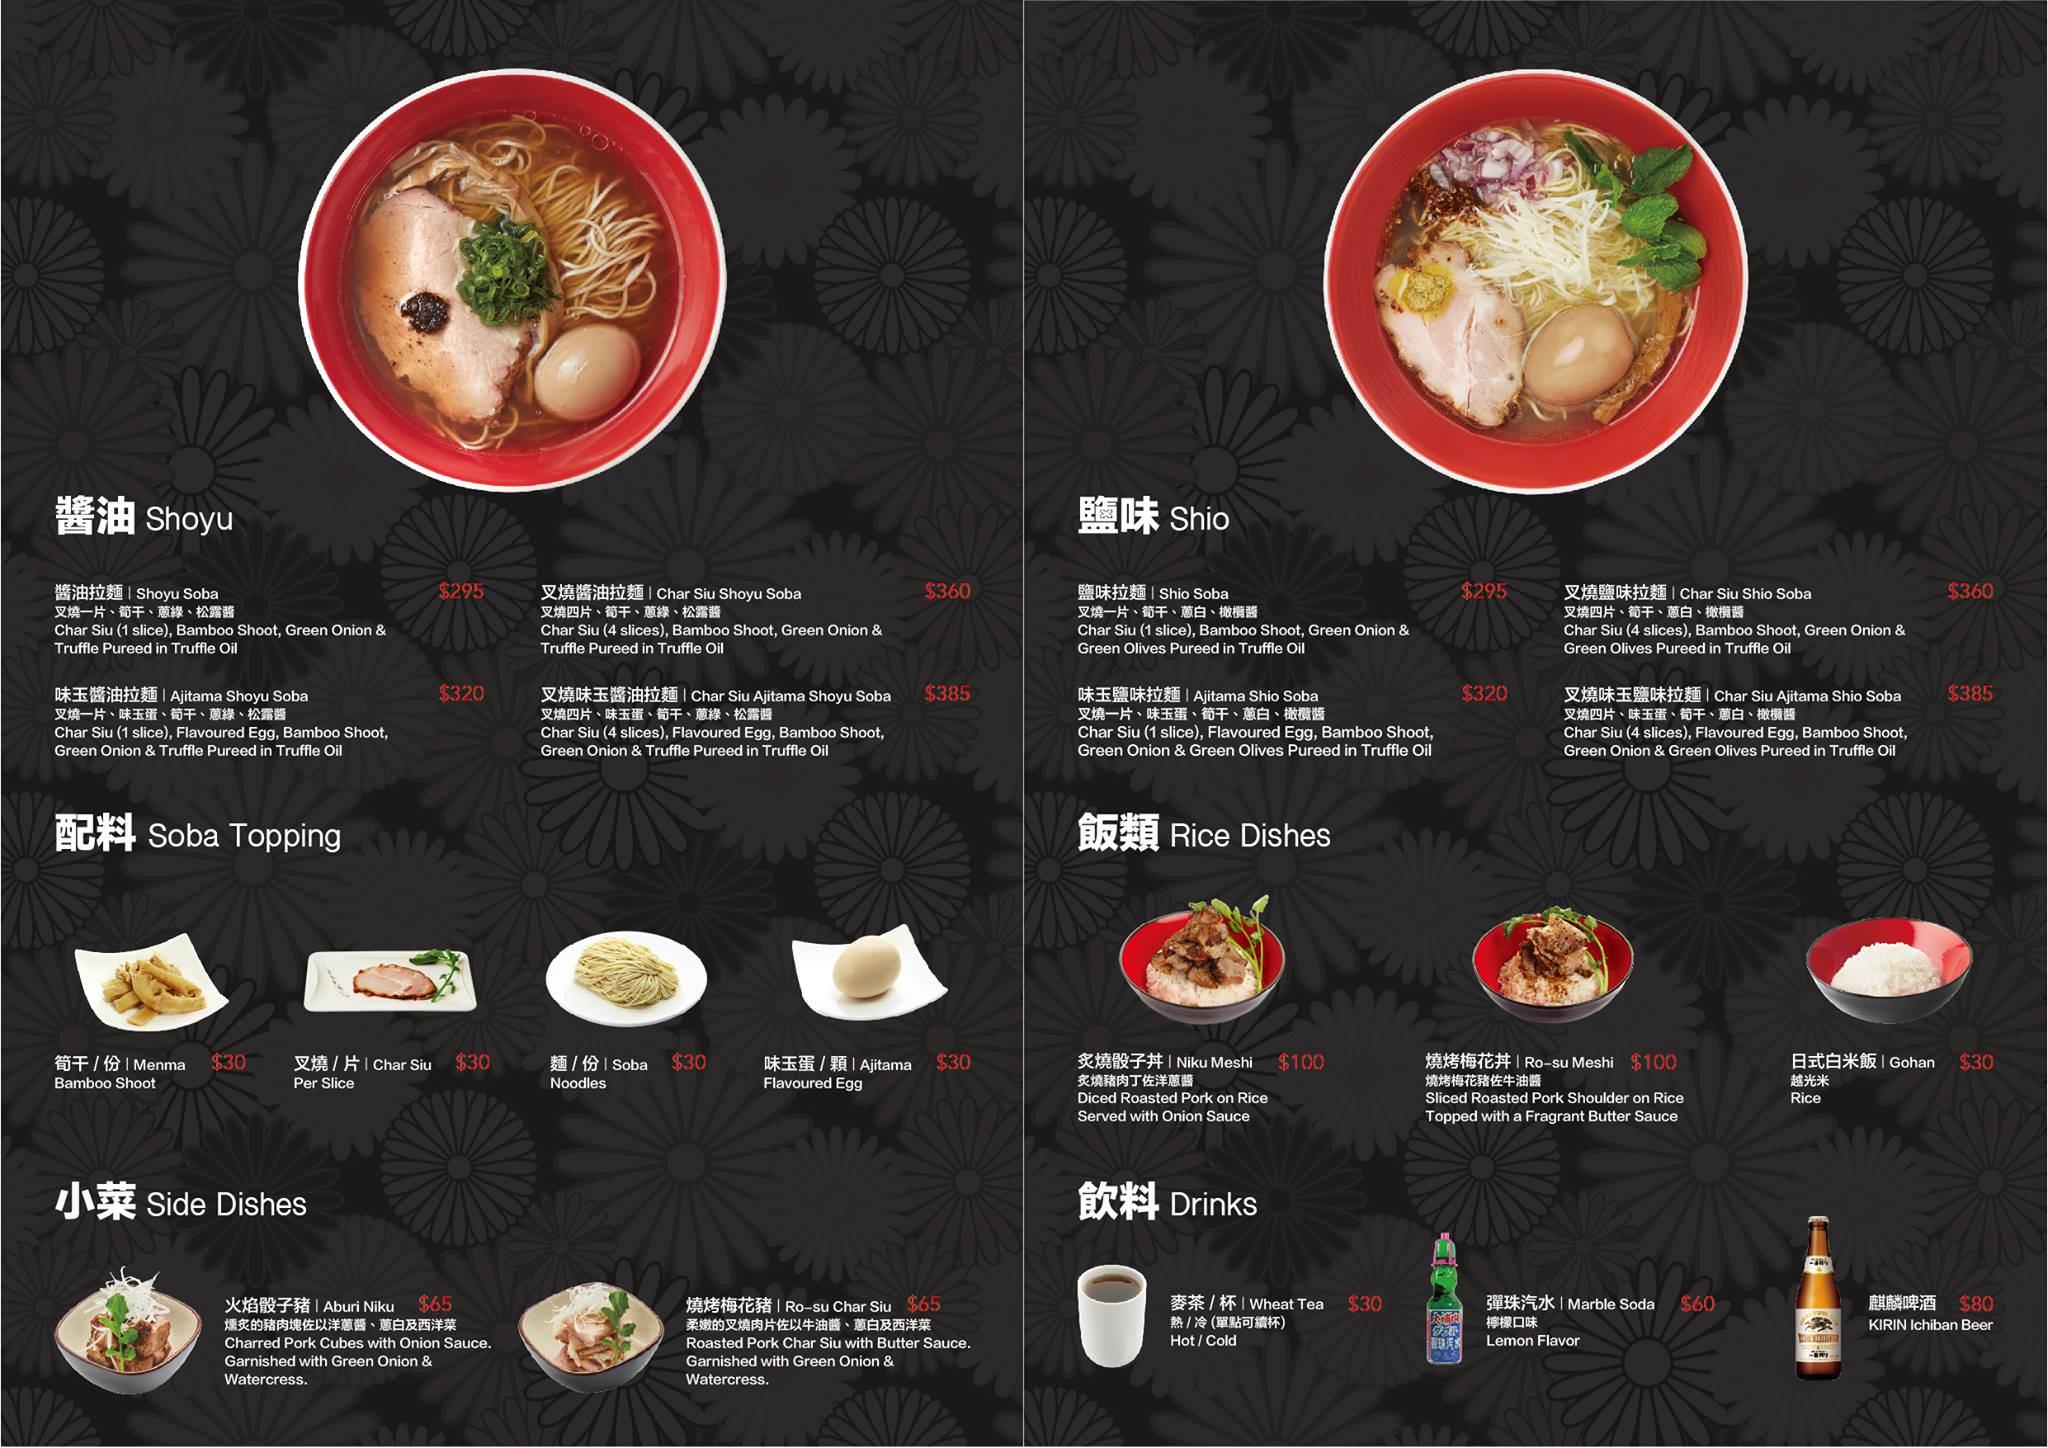 20171215003307 37 - Tsuta蔦,米其林美食,湯頭清澈的拉麵,味道卻很濃郁~